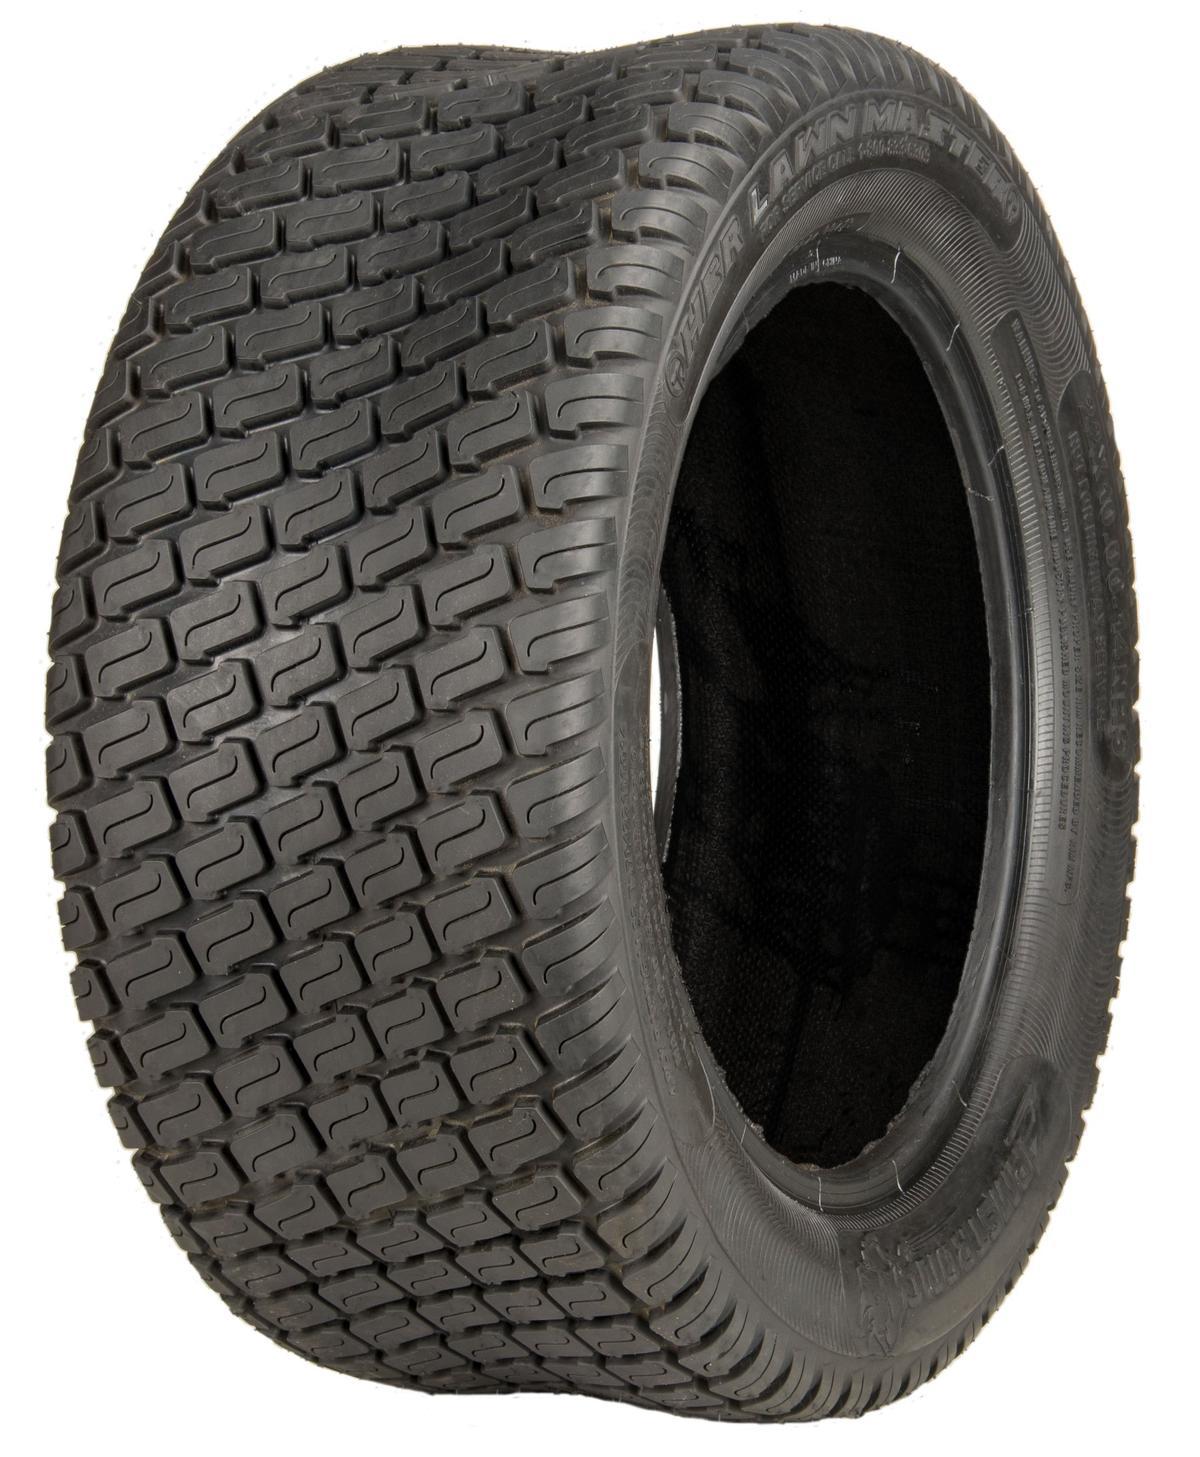 OTR Hbr Lawnmaster 26-12.00-16 4 Ply Yard - Lawn Tire